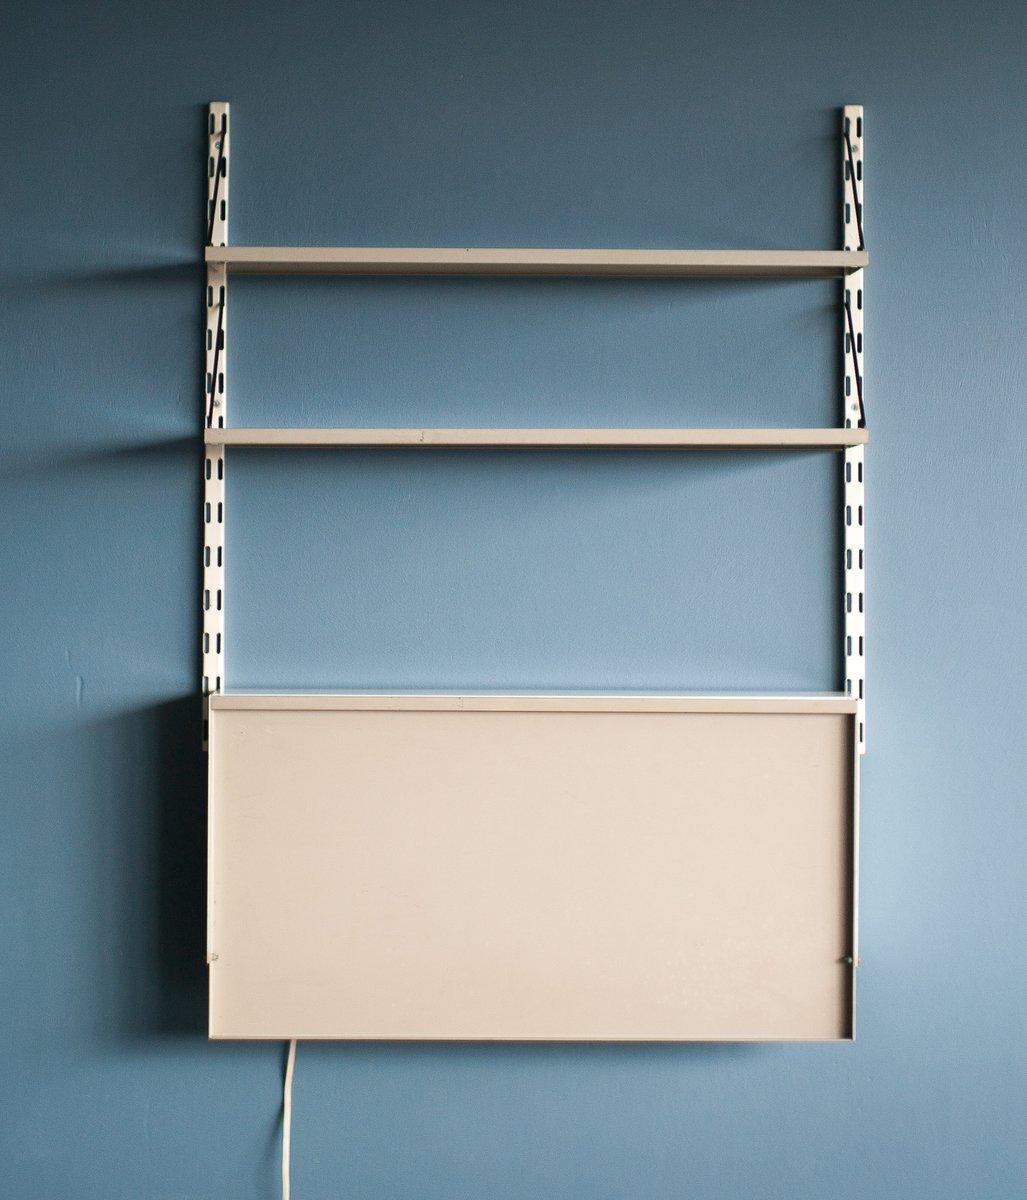 wandregal mit beleuchtetem sekret r von tjerk reijenga f r pilastro 1958 bei pamono kaufen. Black Bedroom Furniture Sets. Home Design Ideas